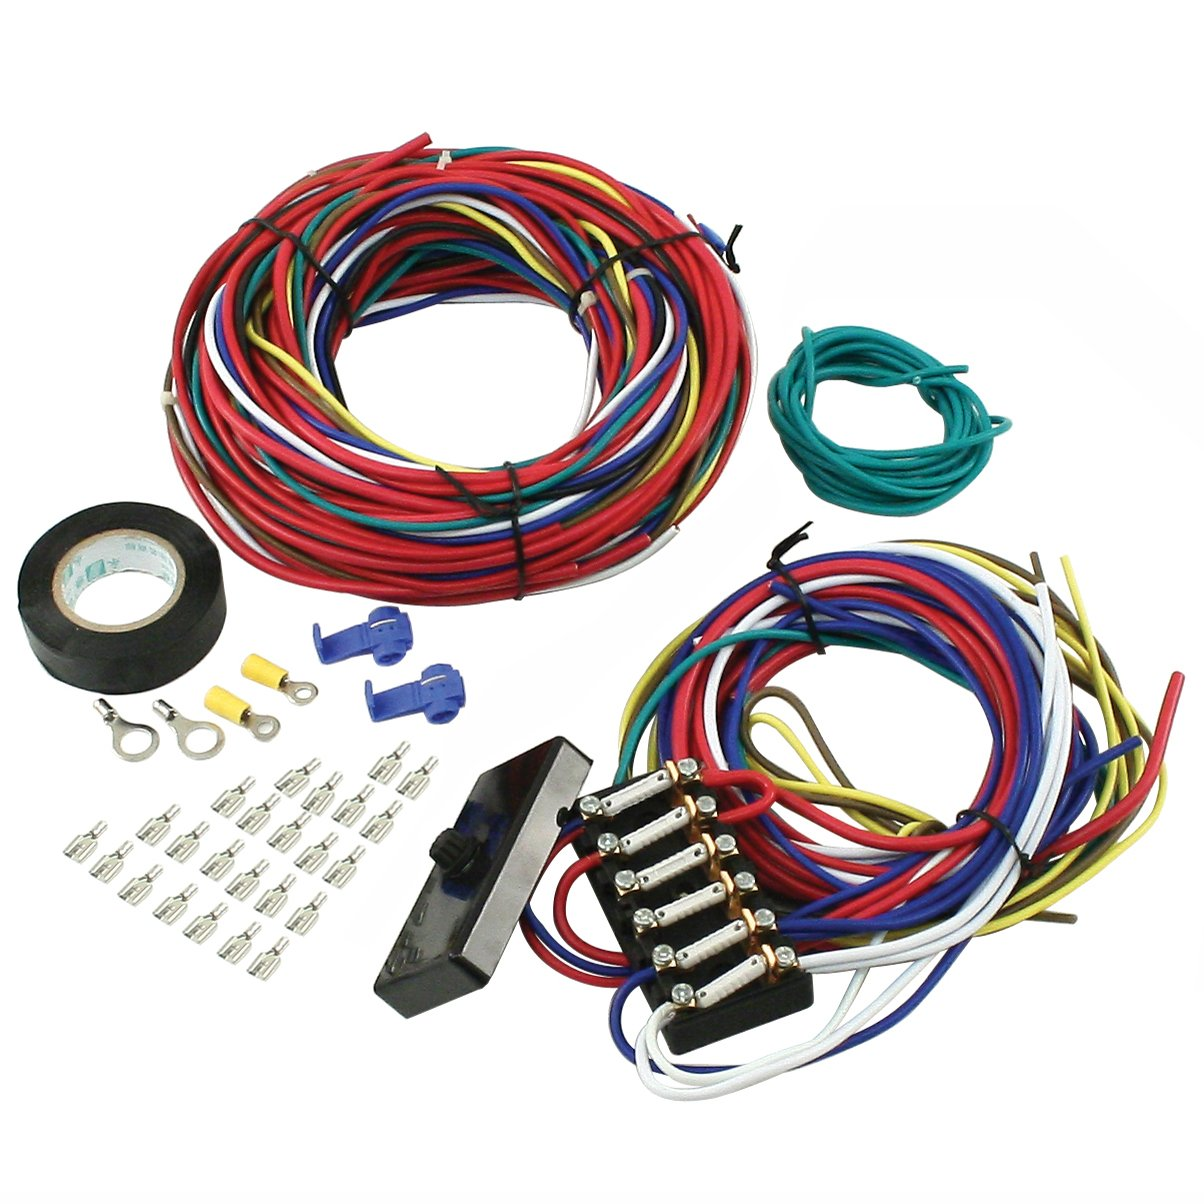 Empi 00-9466-0 Wire Loom Kit Vw Buggy Sand Rail Universal